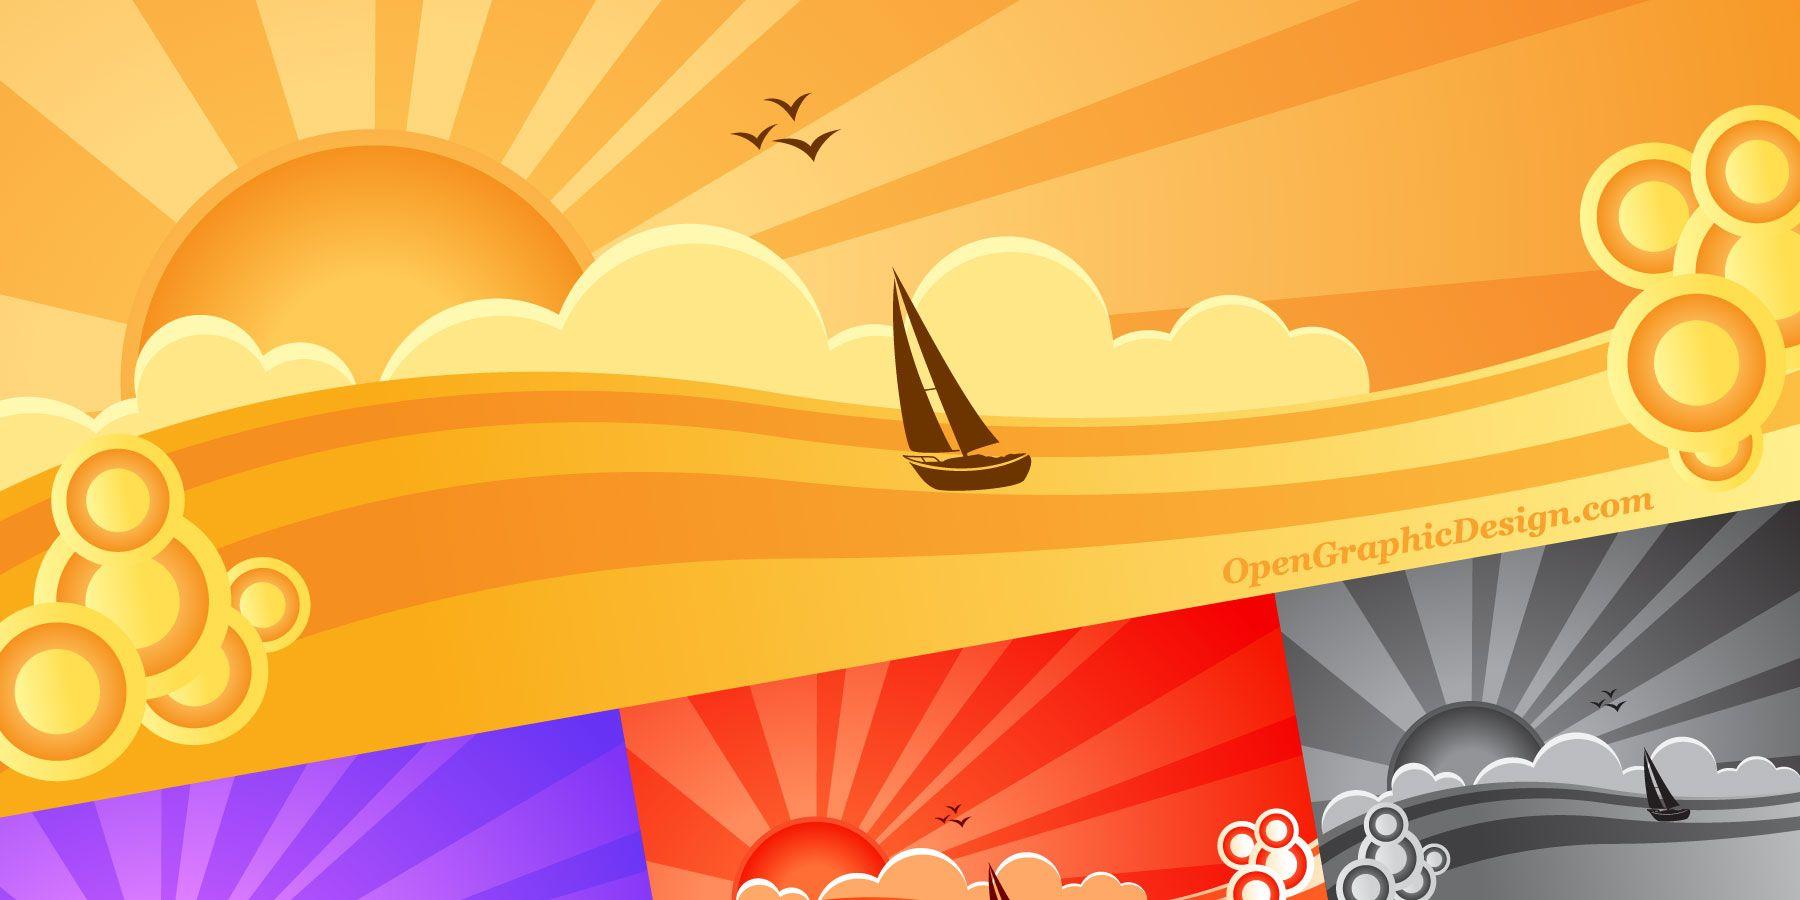 Summer beach scene vector stock vector colourbox - Free Vector Snowflakes Download Winter Snow Flakes Clip Art